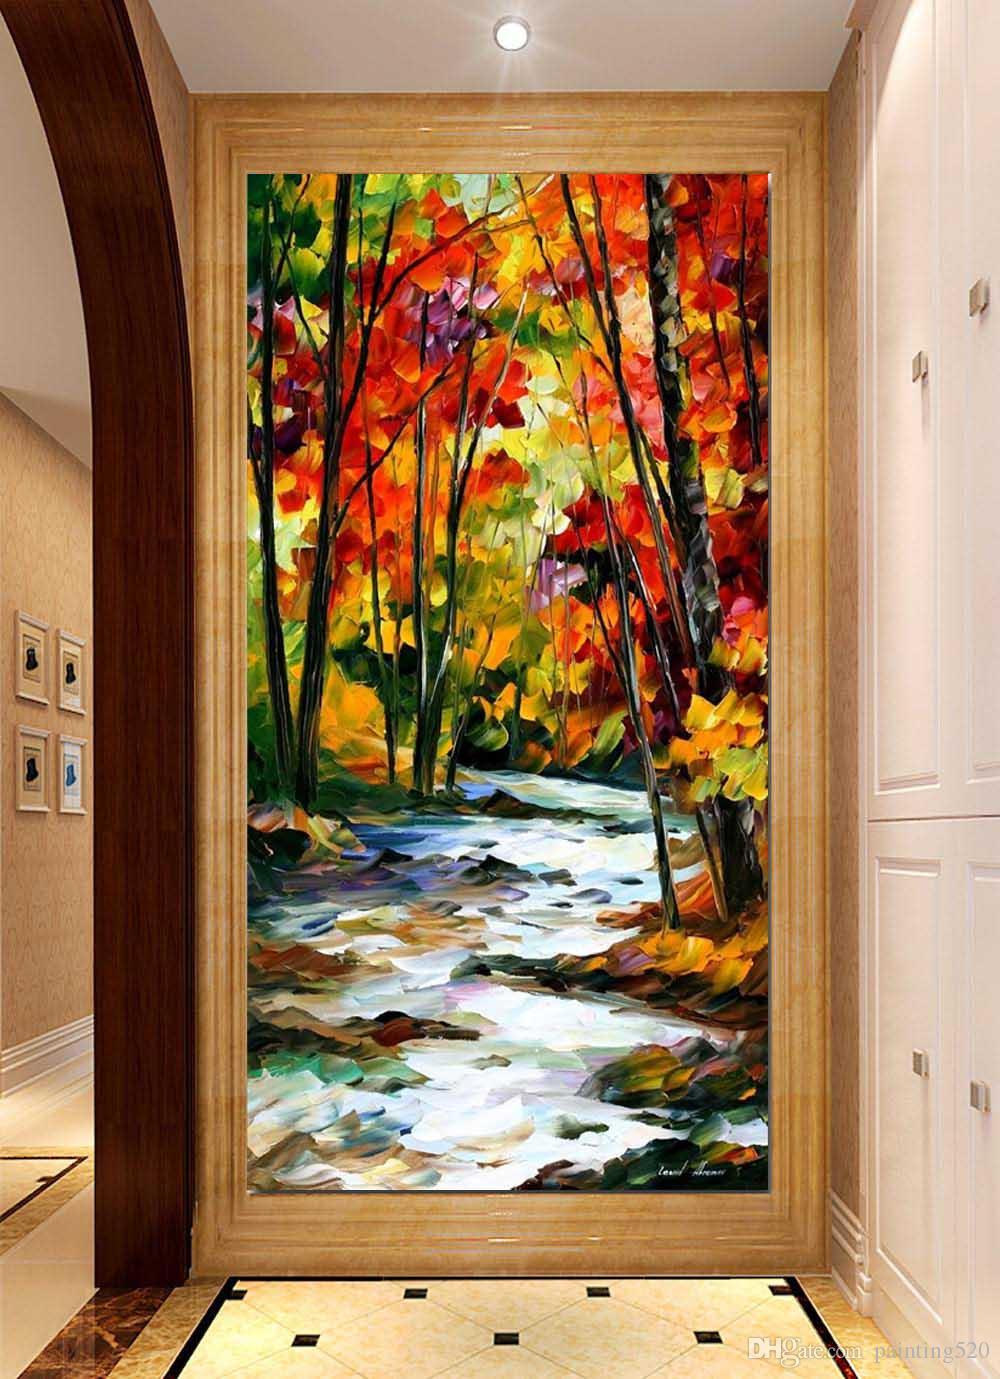 Alta calidad moderna sala de estar simple estilo decorativo pintura al óleo de la lona pintada a mano paleta de pintura al óleo JL428